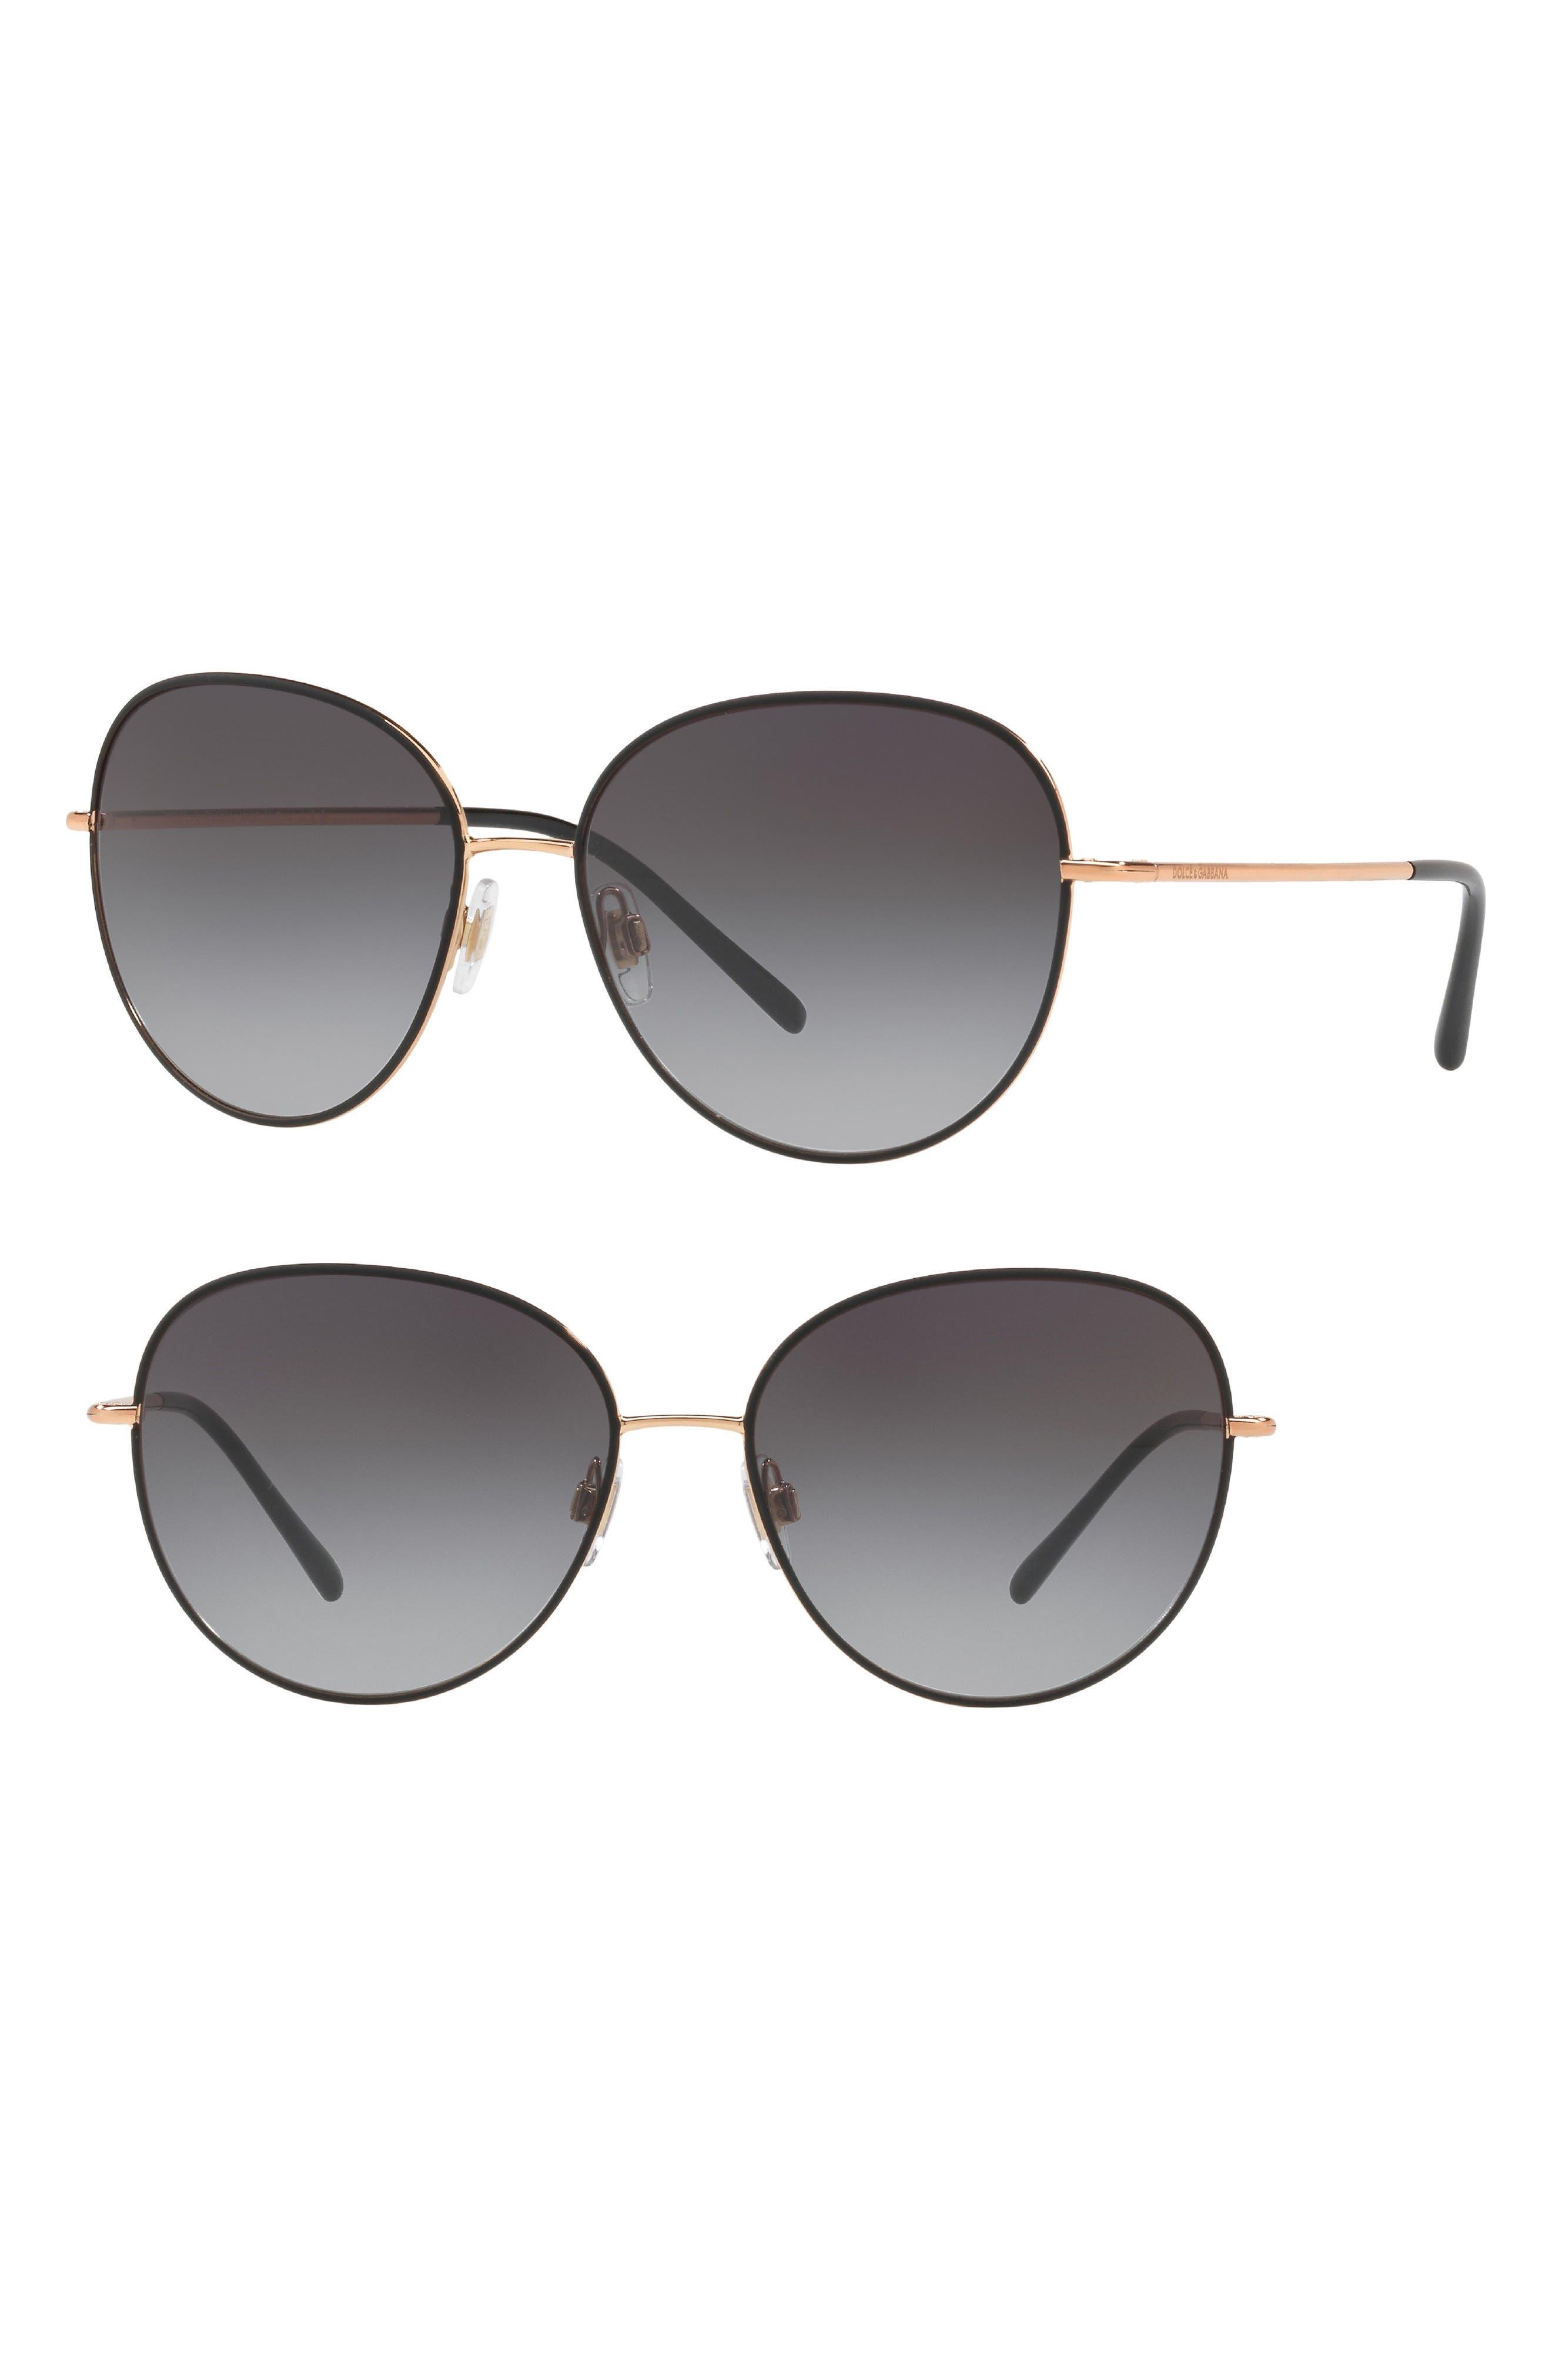 ae7d828b26f Dolce Gabbana Sunglasses for Women